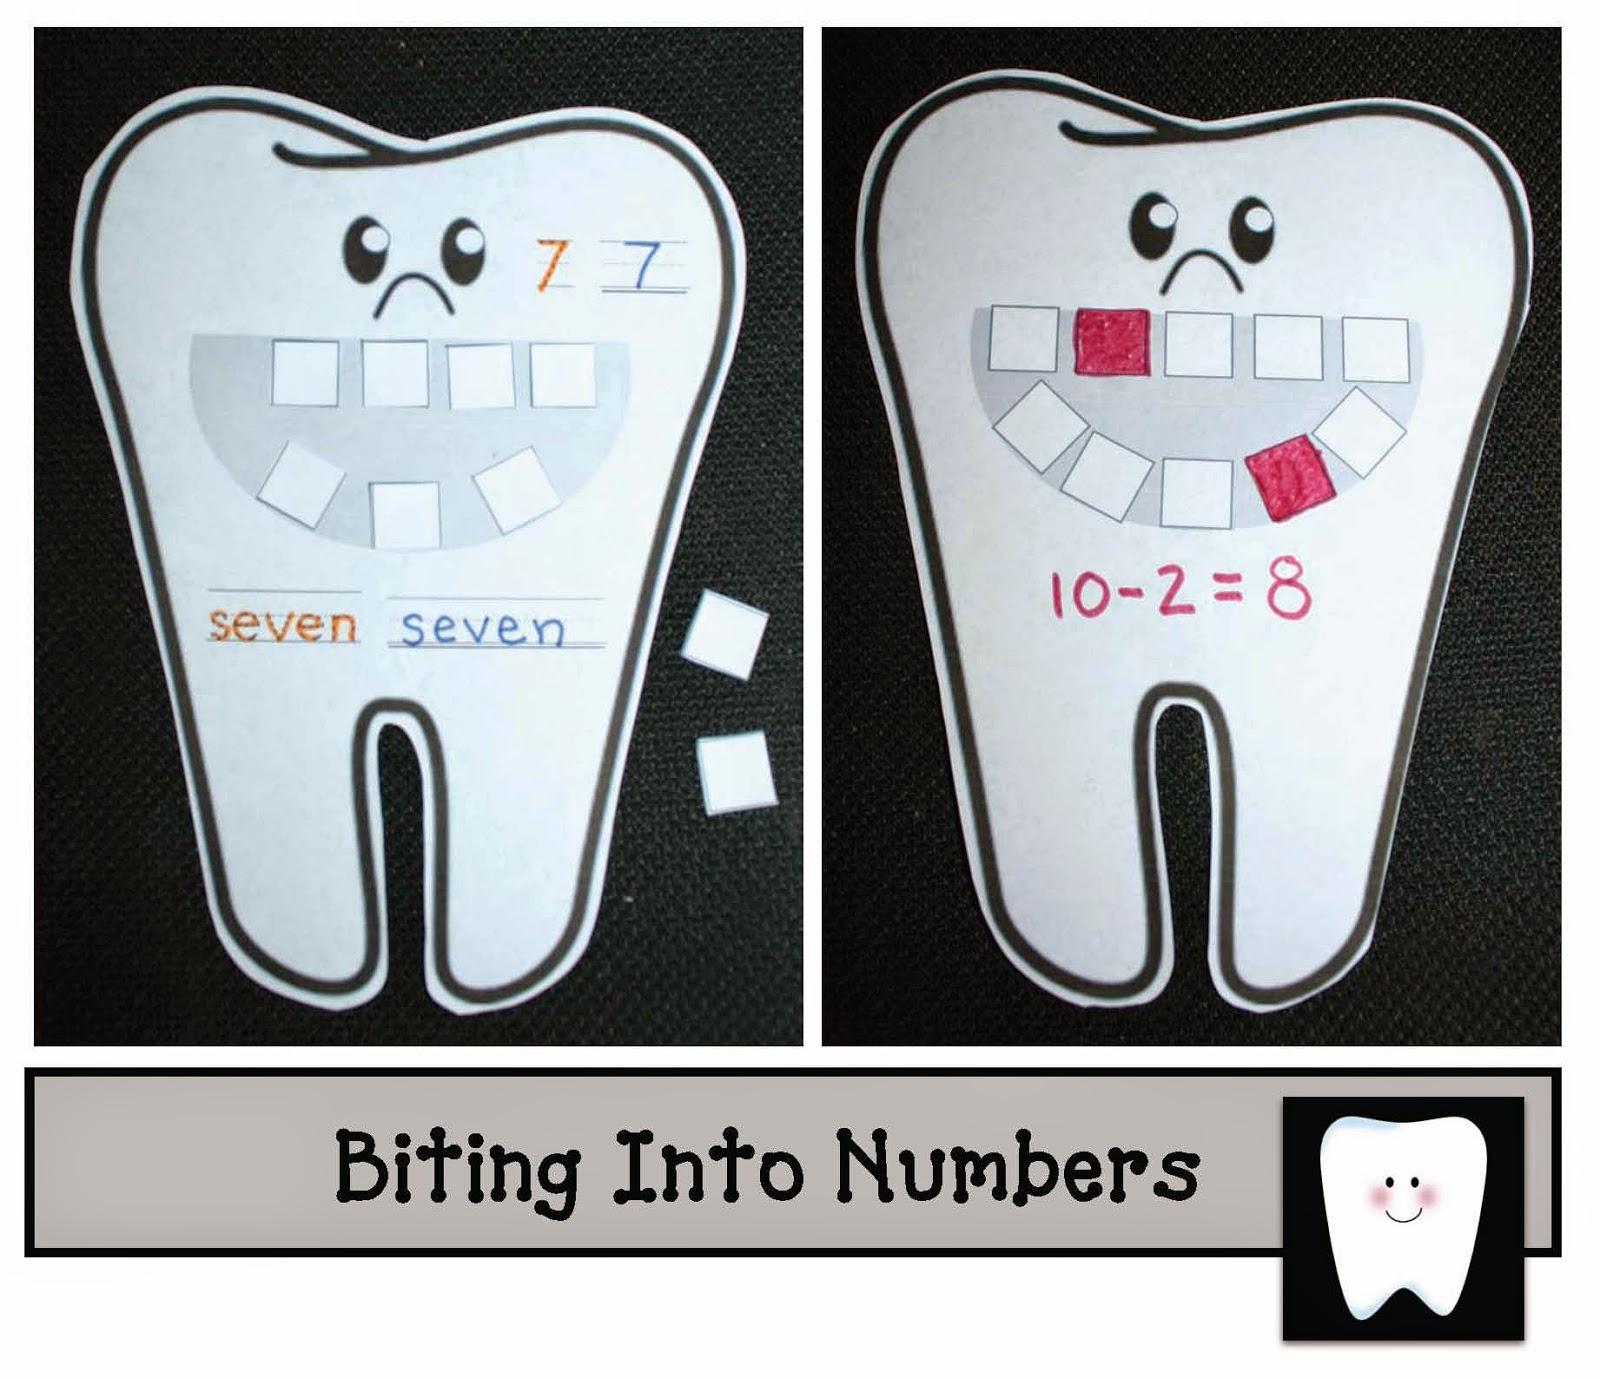 http://2.bp.blogspot.com/-tIheGRDdmL8/VOH0DM-MsbI/AAAAAAAANWI/2hTUtyu8IIY/s1600/tooth%2Bcounting%2Bcenters%2Bcov.jpg